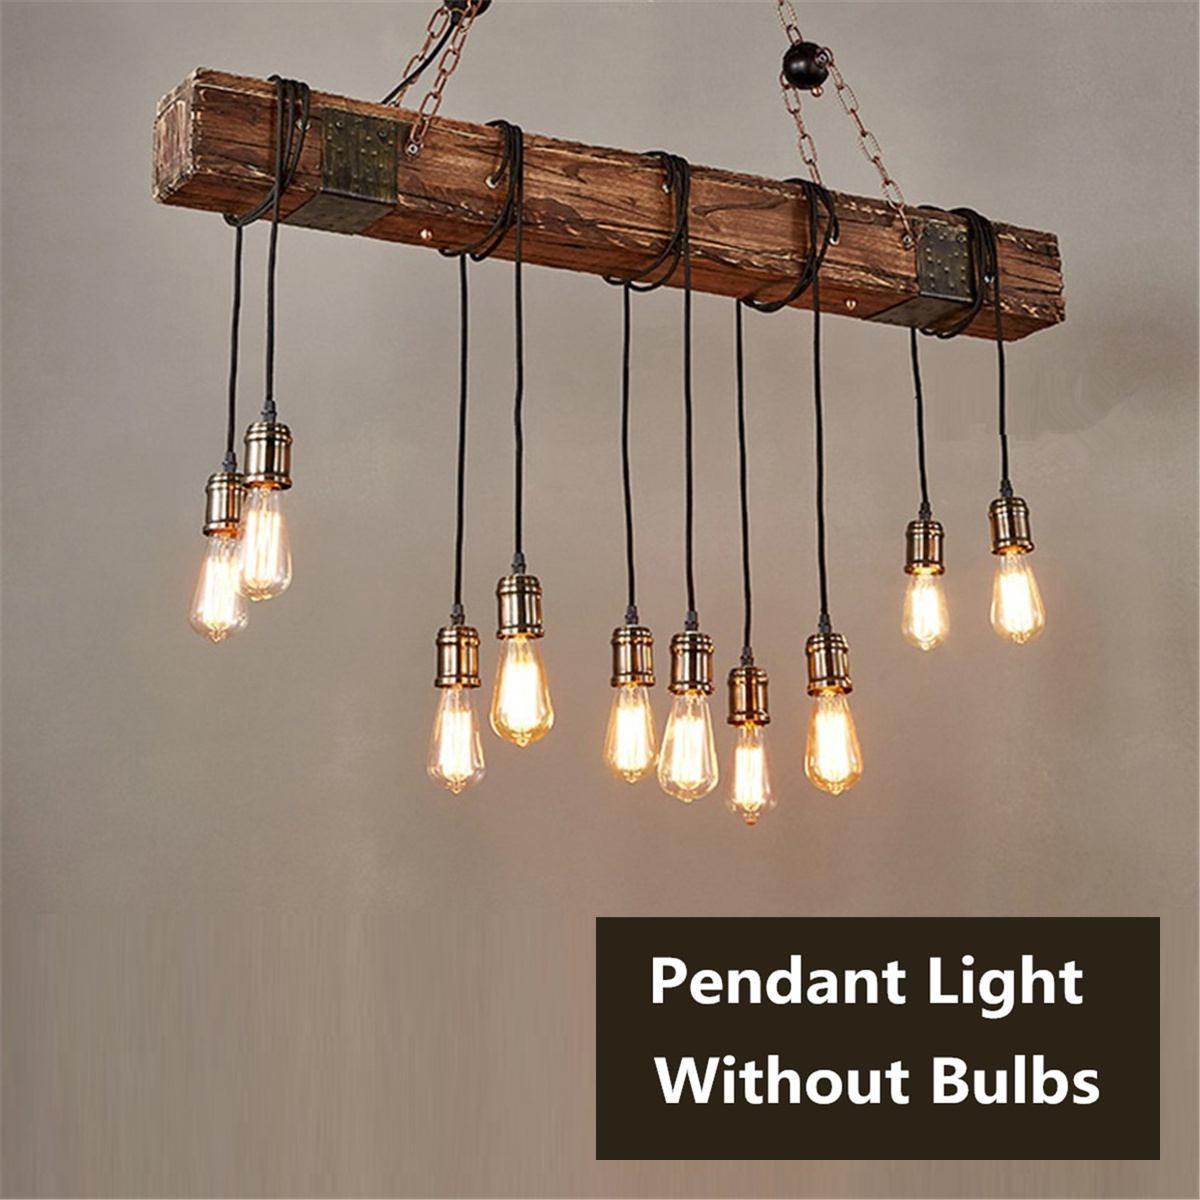 110v vintage wood industrial pendant light hanging lamp light rustic indoor lighting fixture restaurant bar home decoration